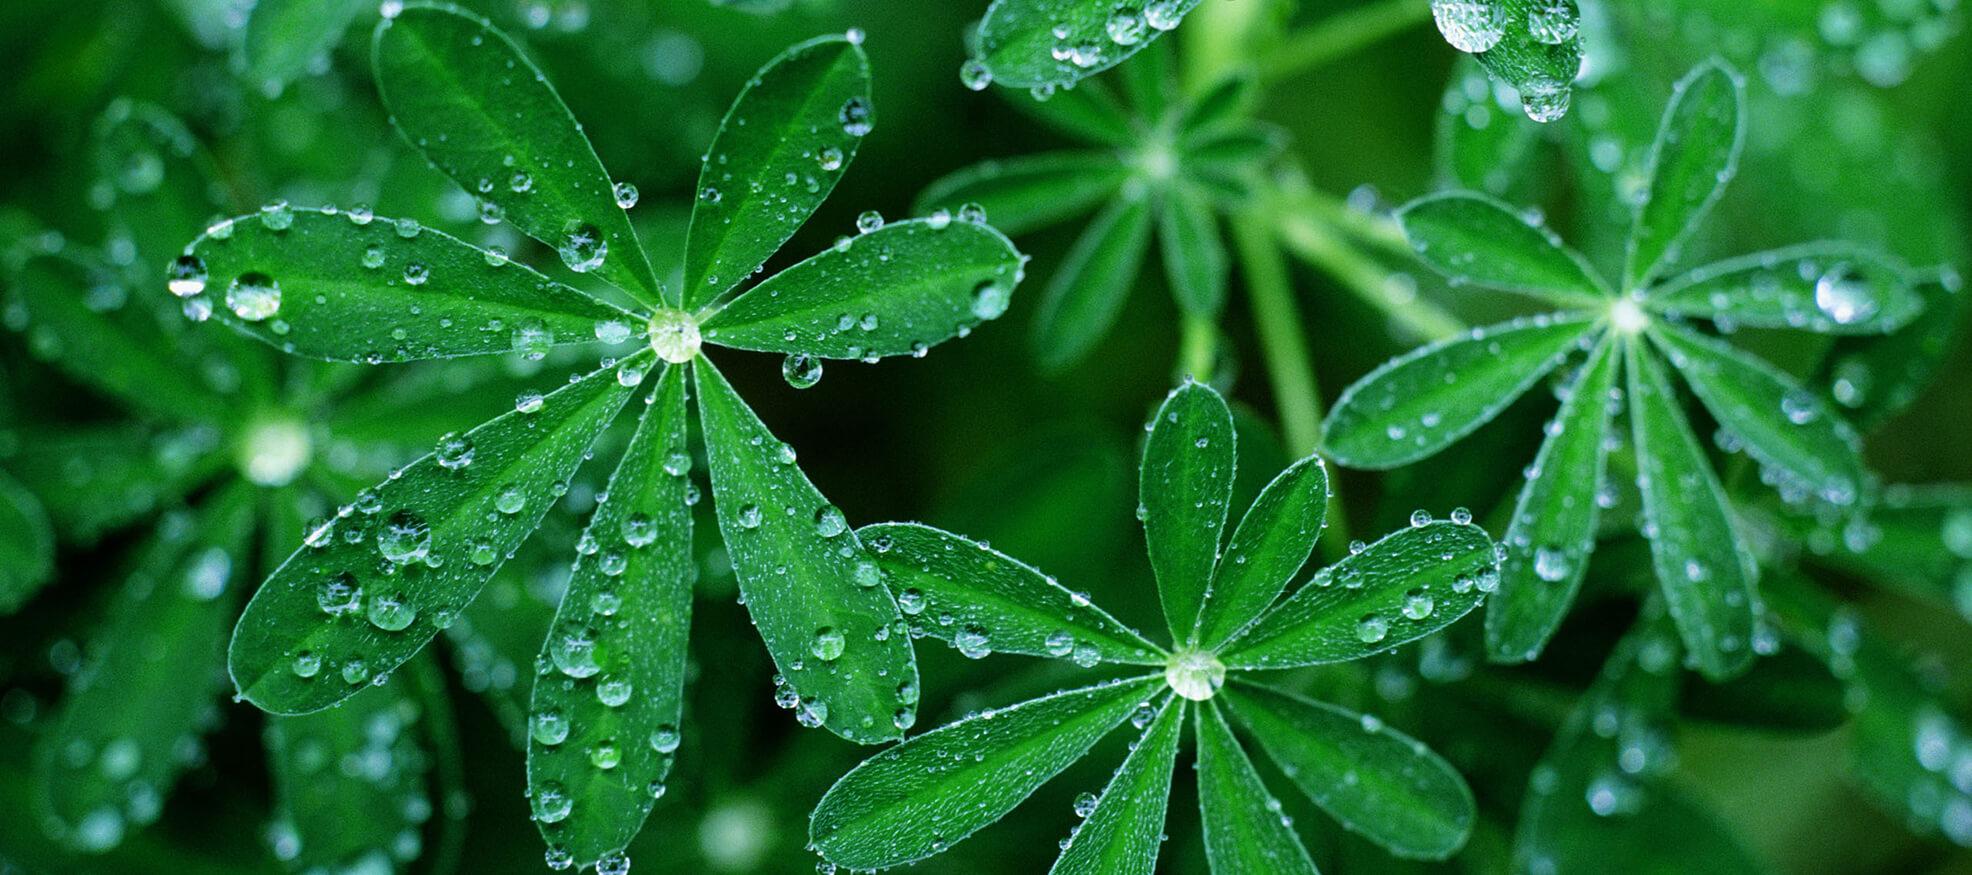 leaves water drops